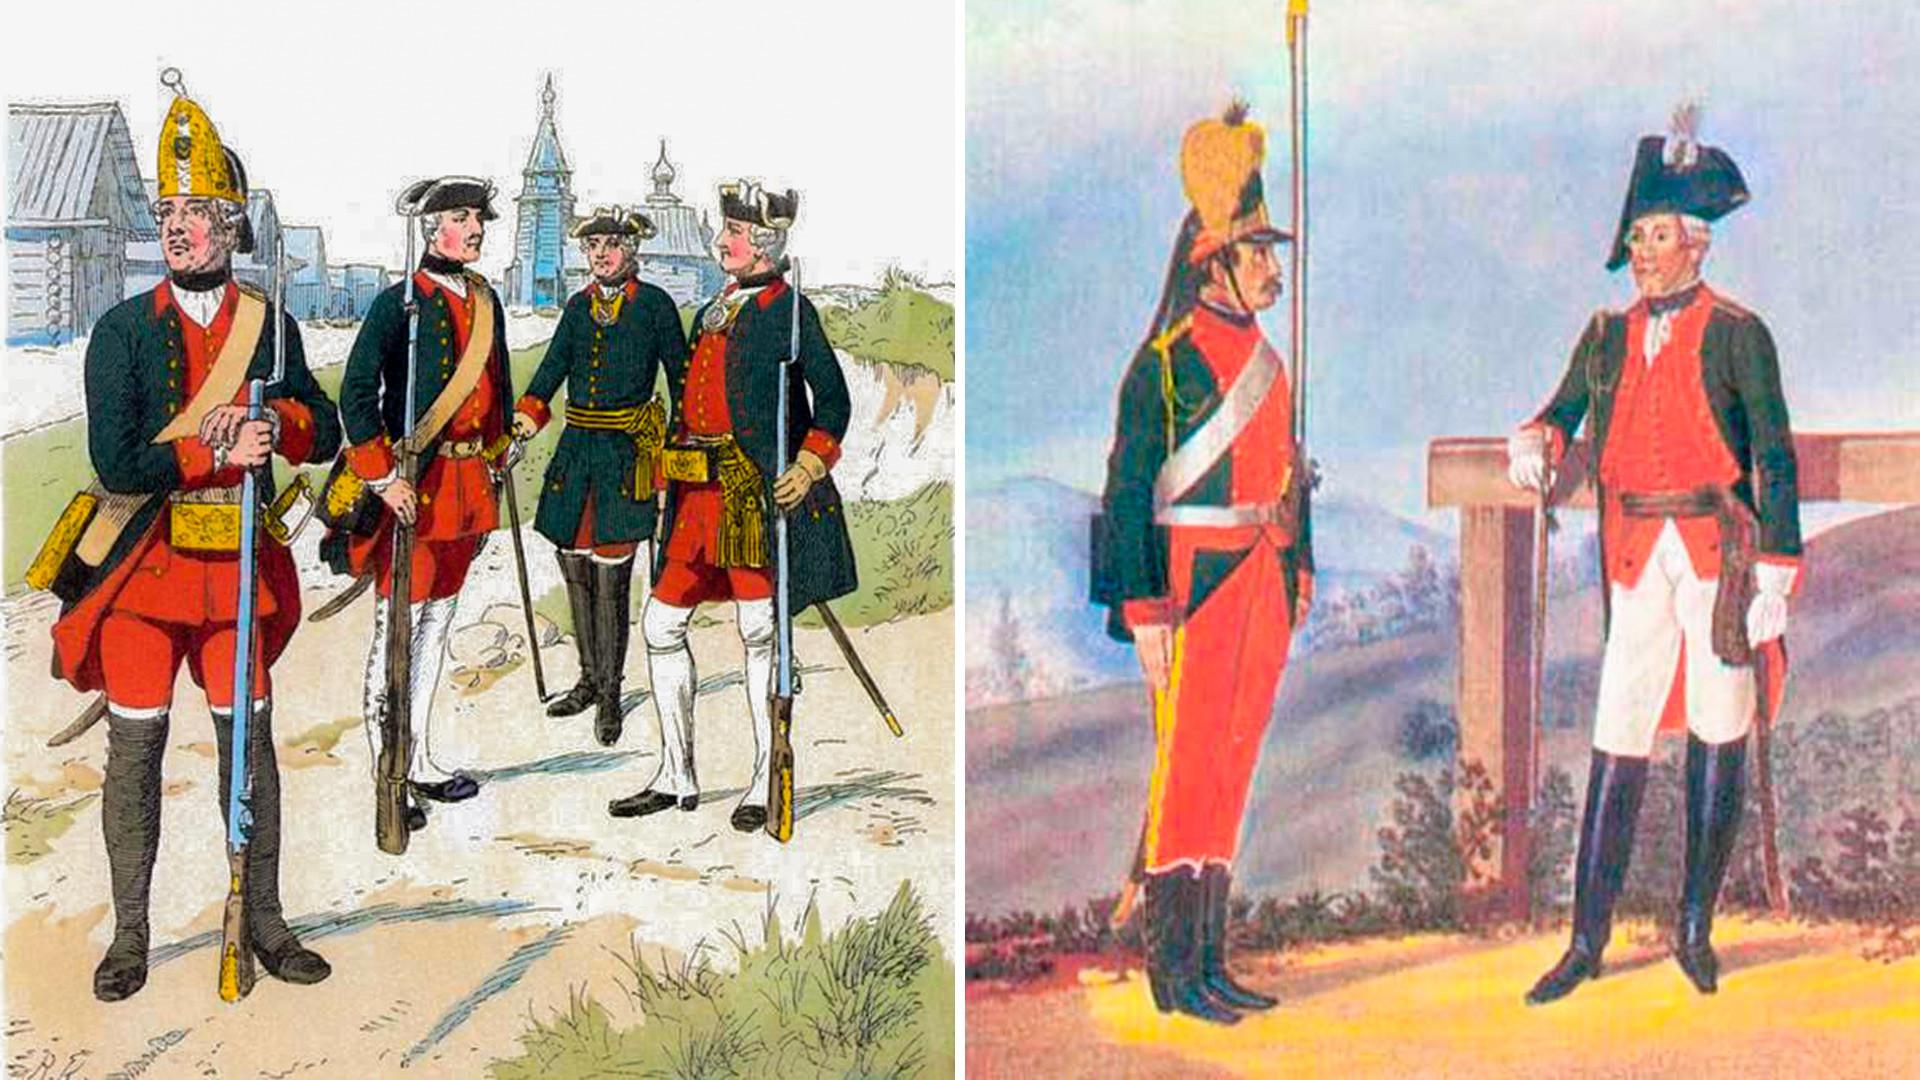 Reforma vojske (prije i poslije reforme)